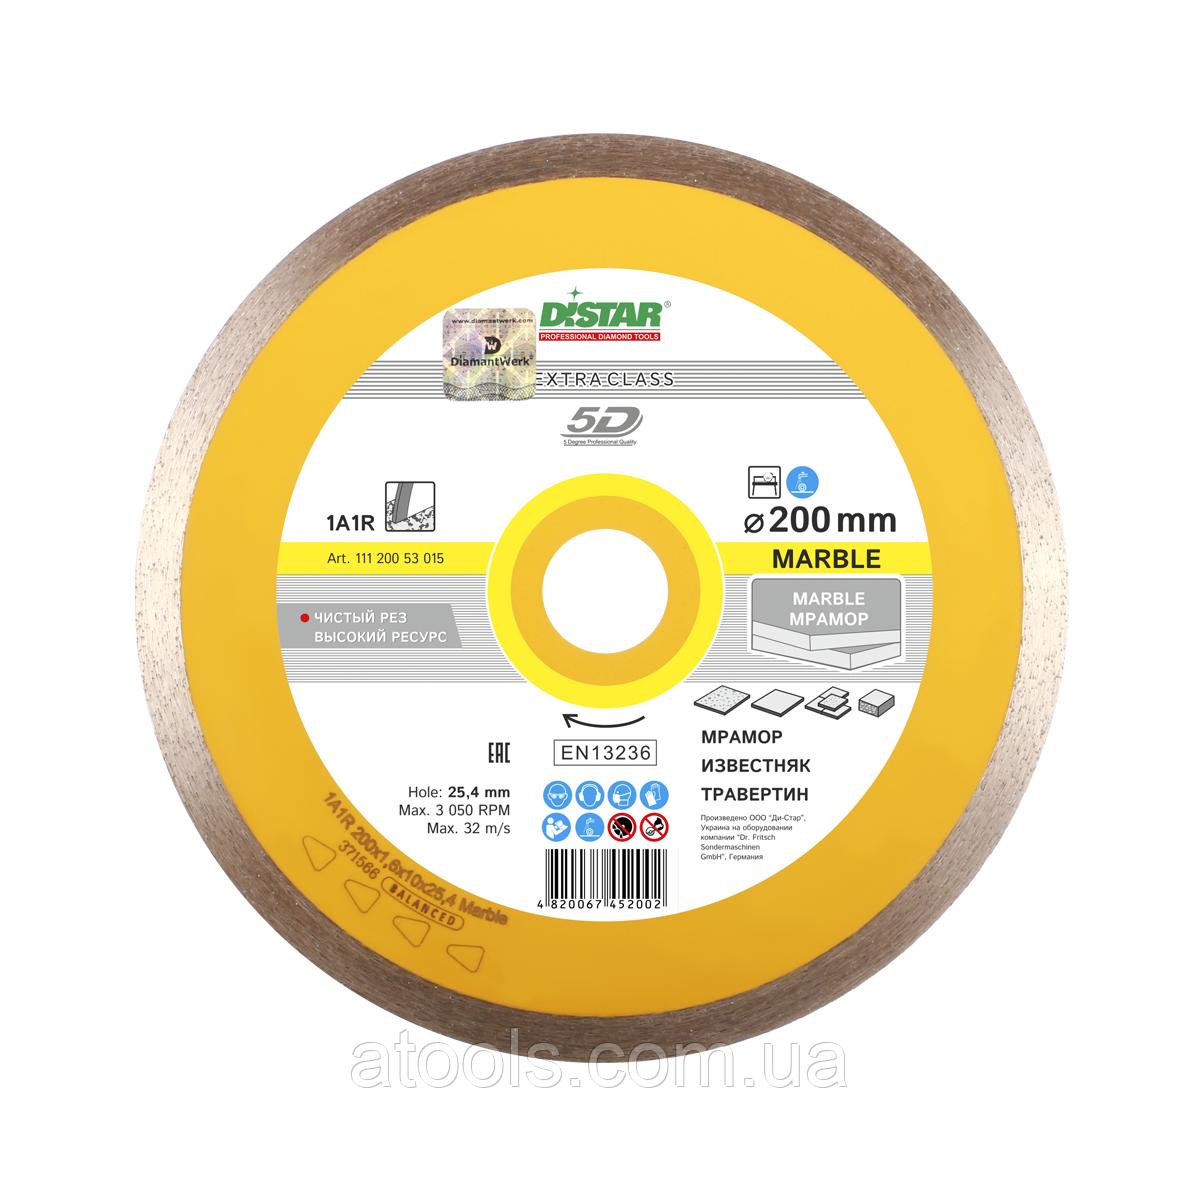 Алмазный отрезной диск Distar Marble 1A1R 300x2x10x32 (11127053022)